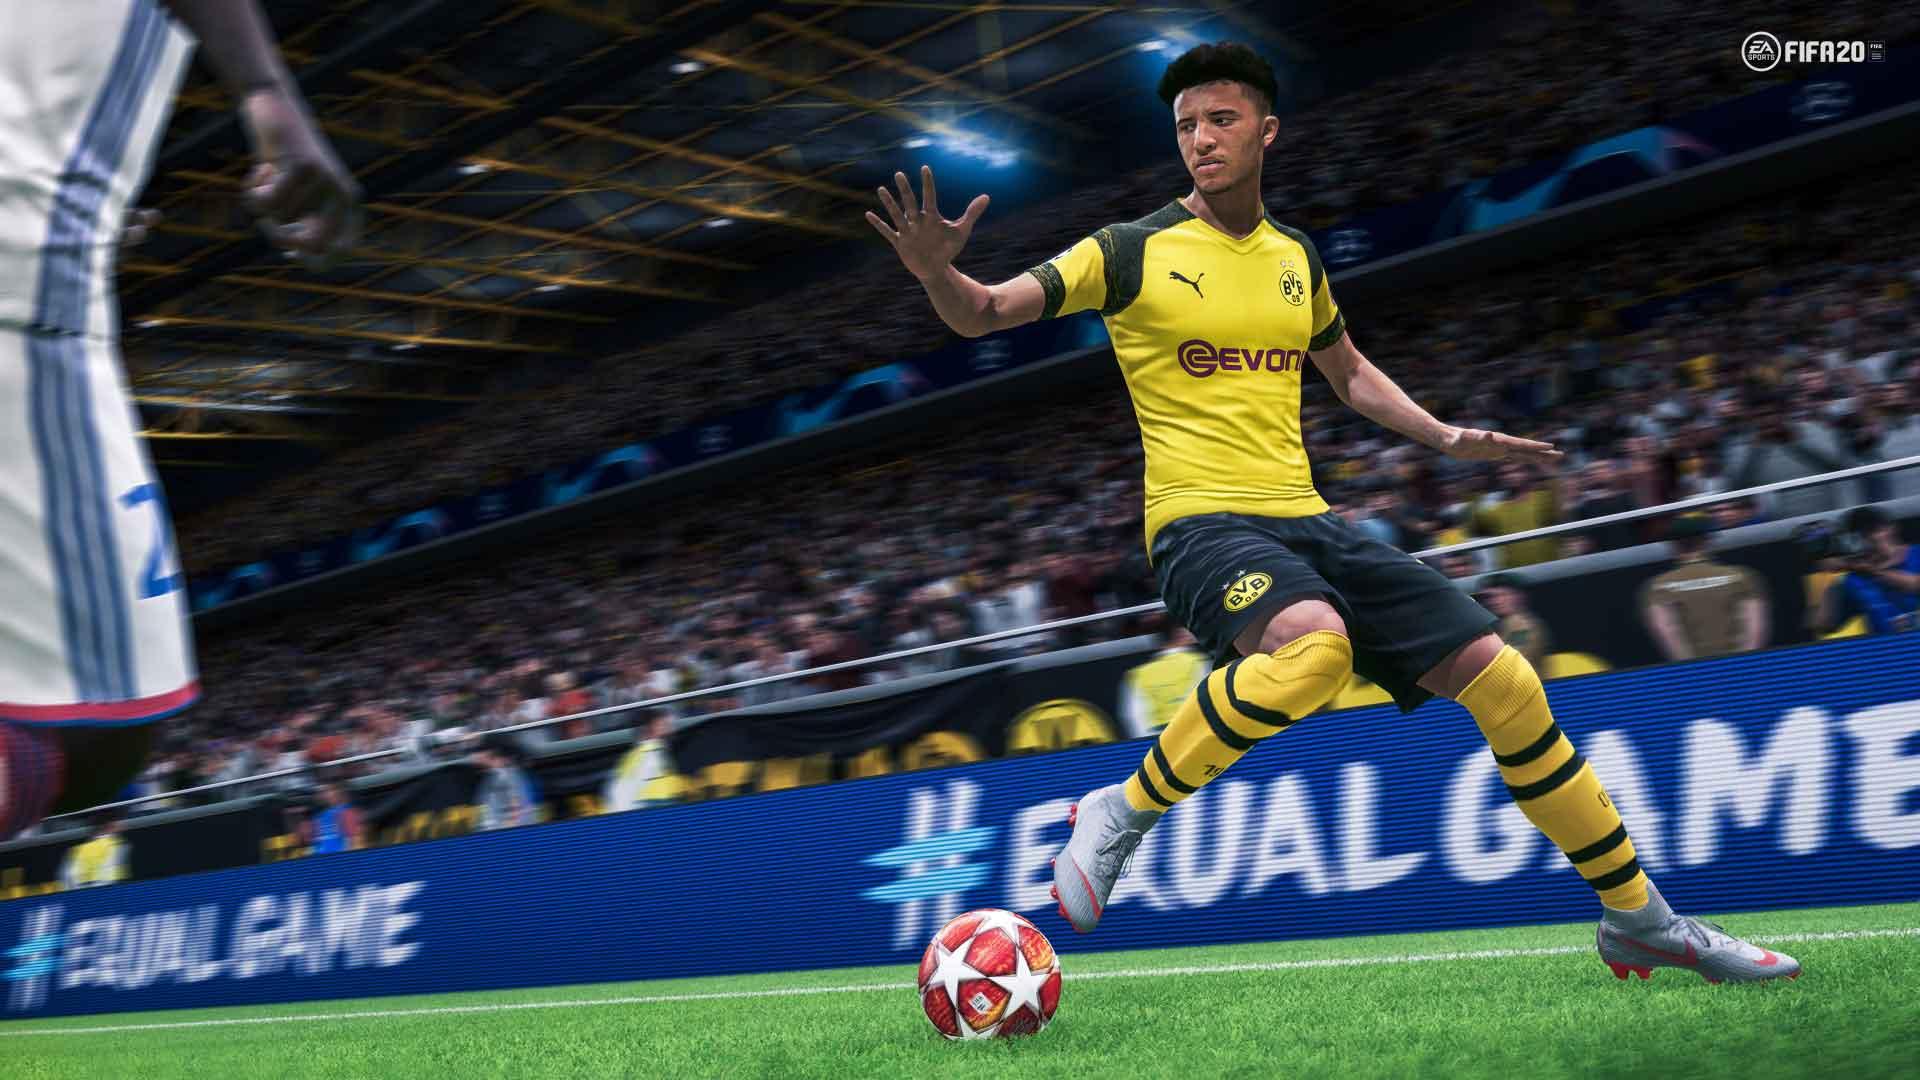 FIFA_20_Sancho_Gameplay_Hero_Hires_WM_16x9